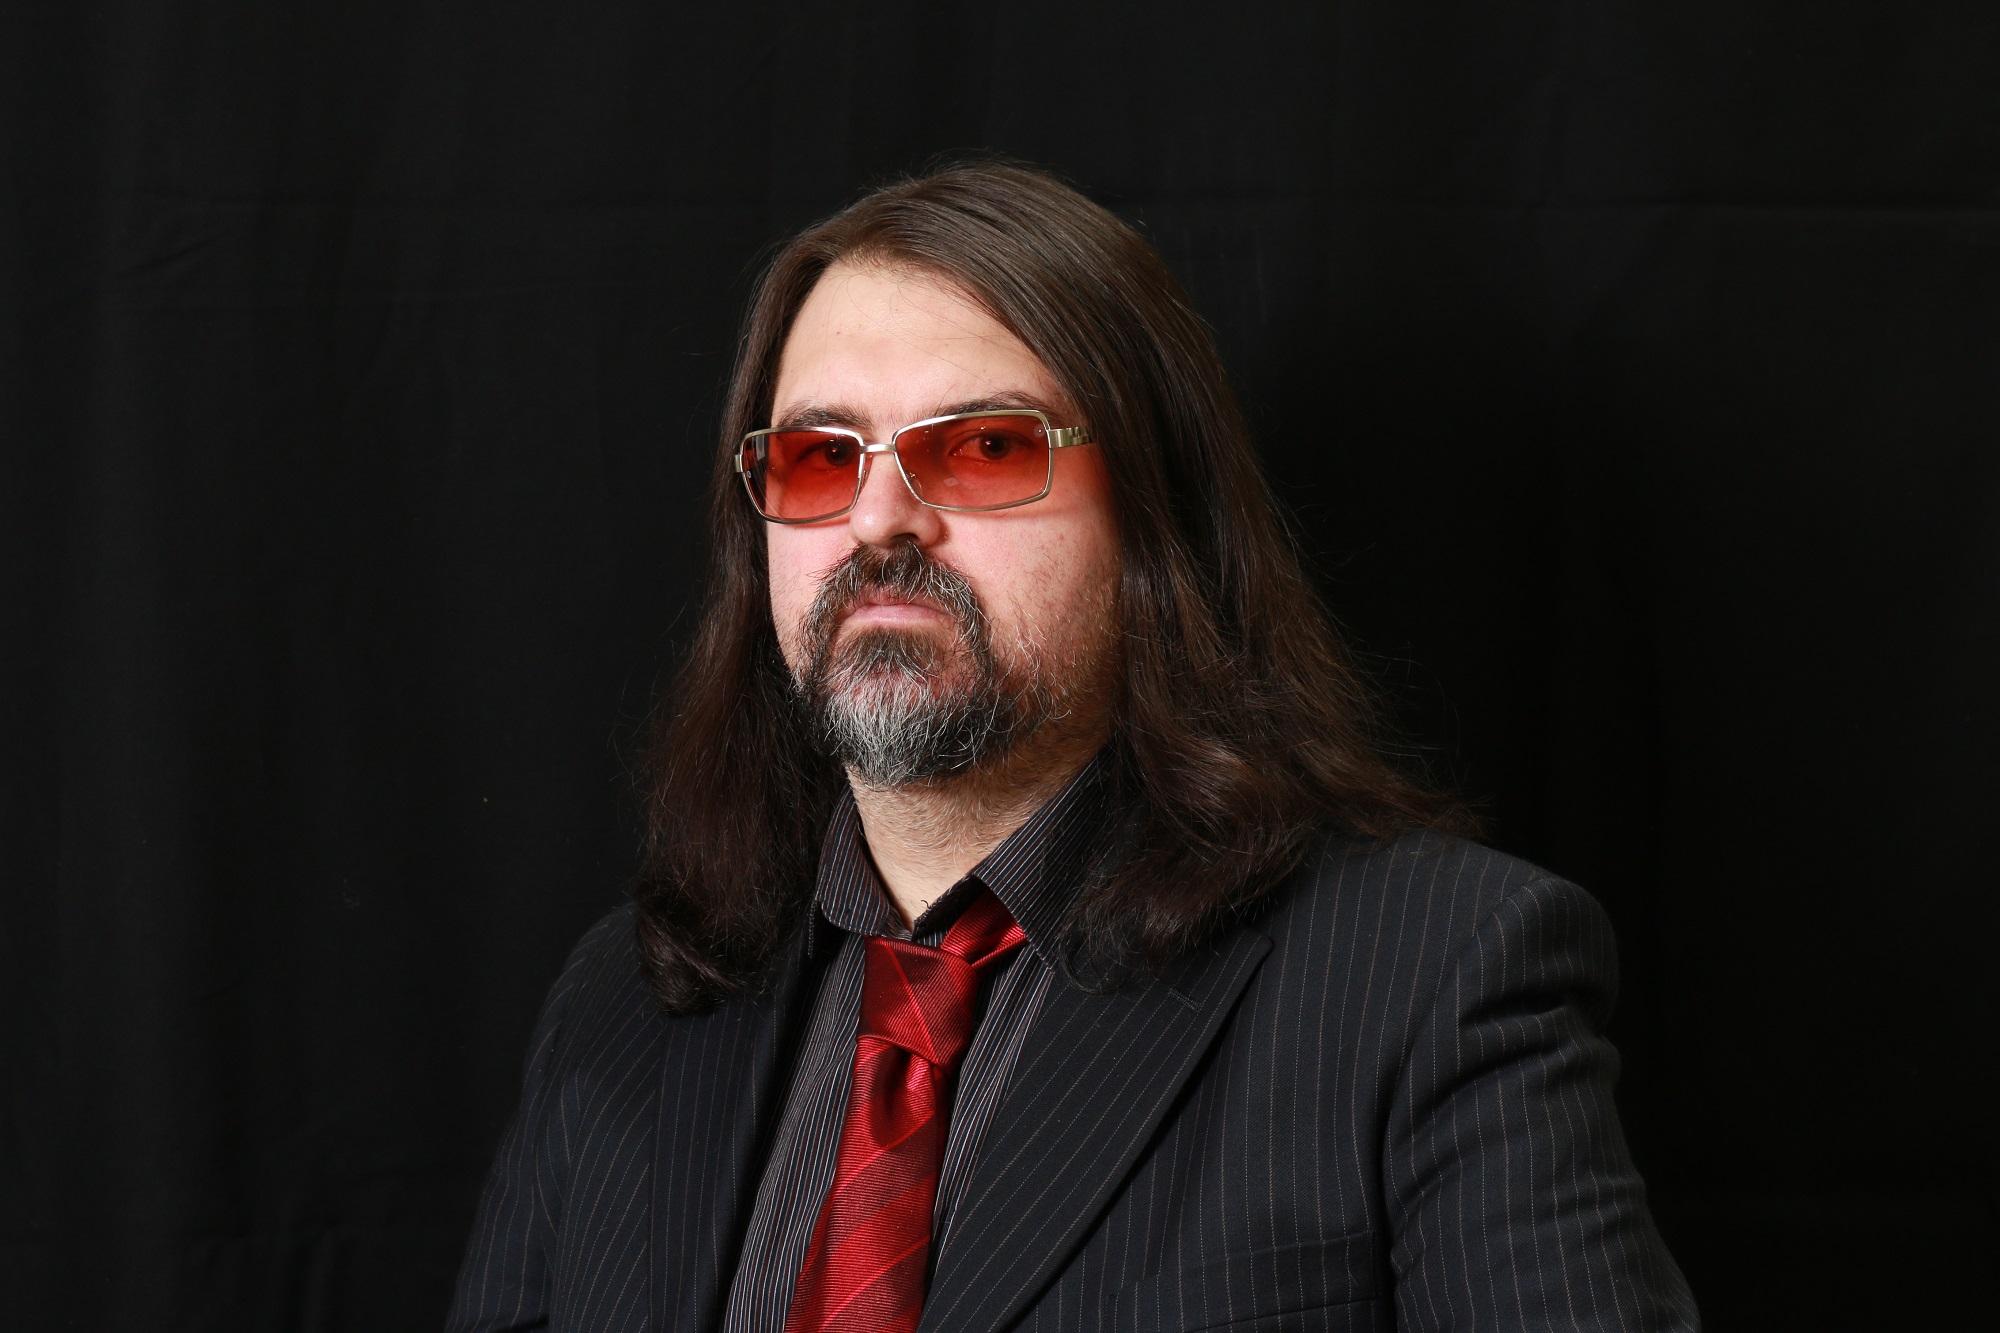 Intervista a Diego Vida, Game Producer ospite a Lucca Comics and Games